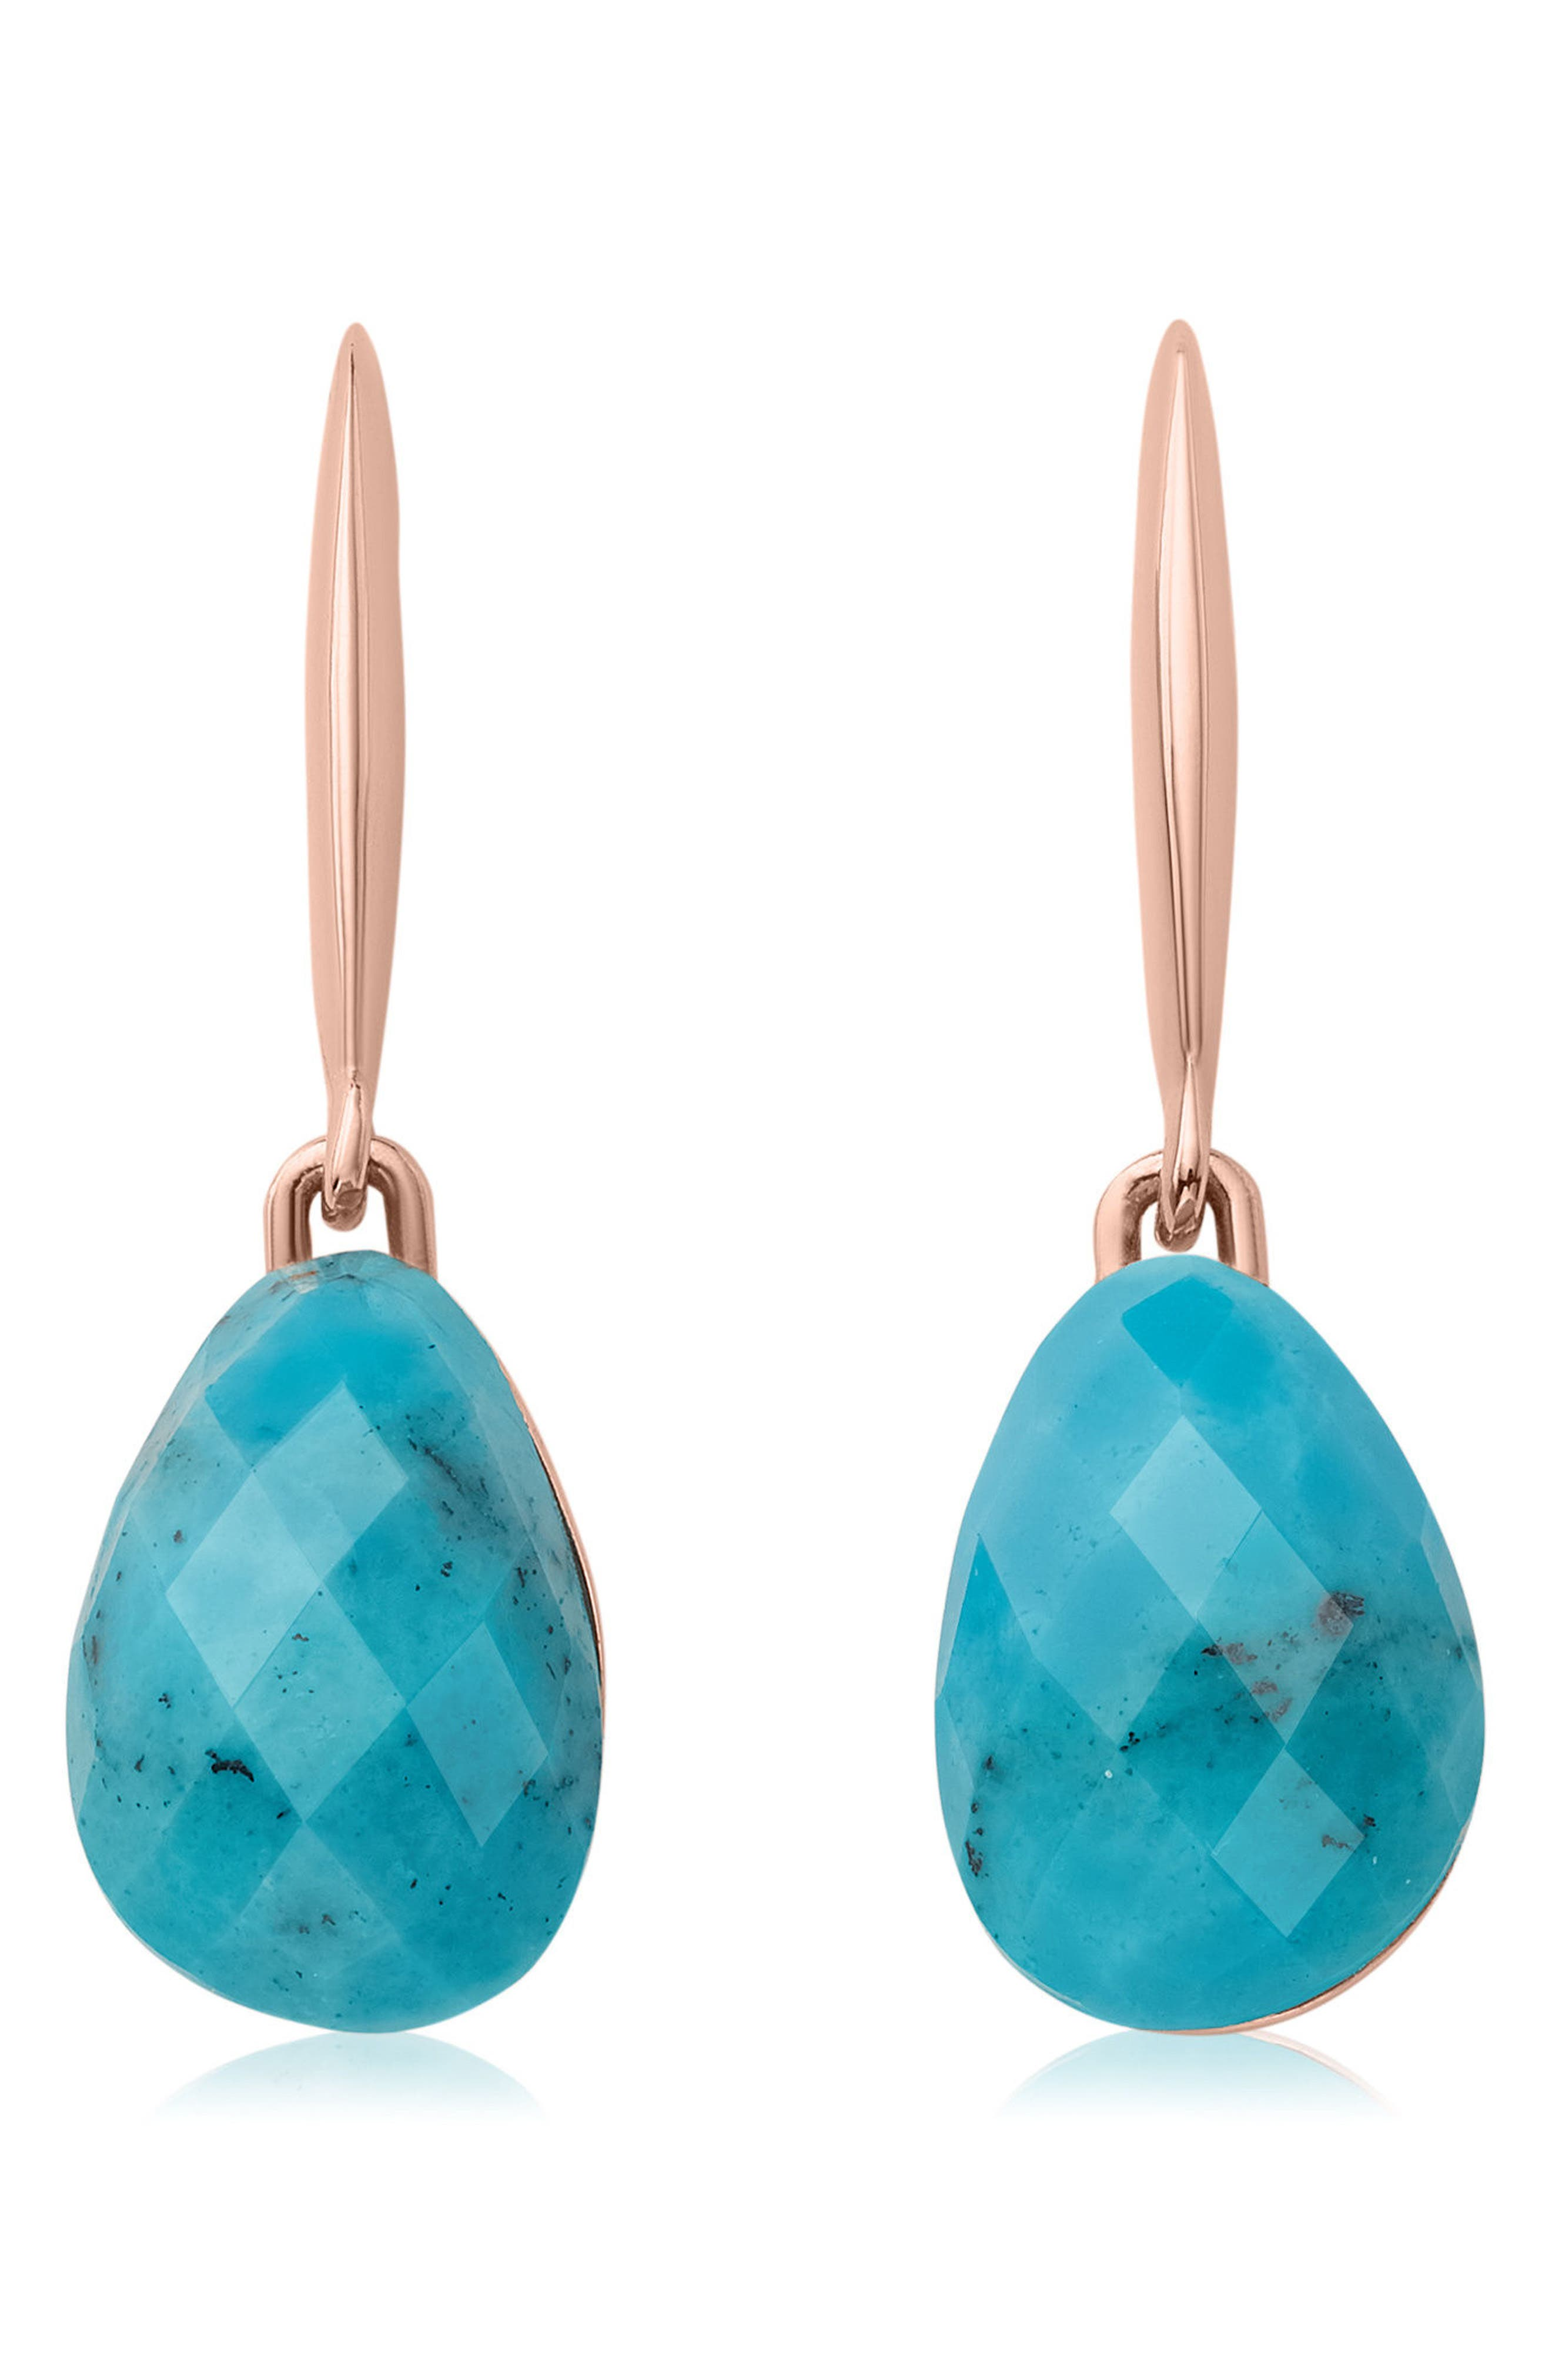 Nura Small Teardrop Earrings,                         Main,                         color, Turquoise